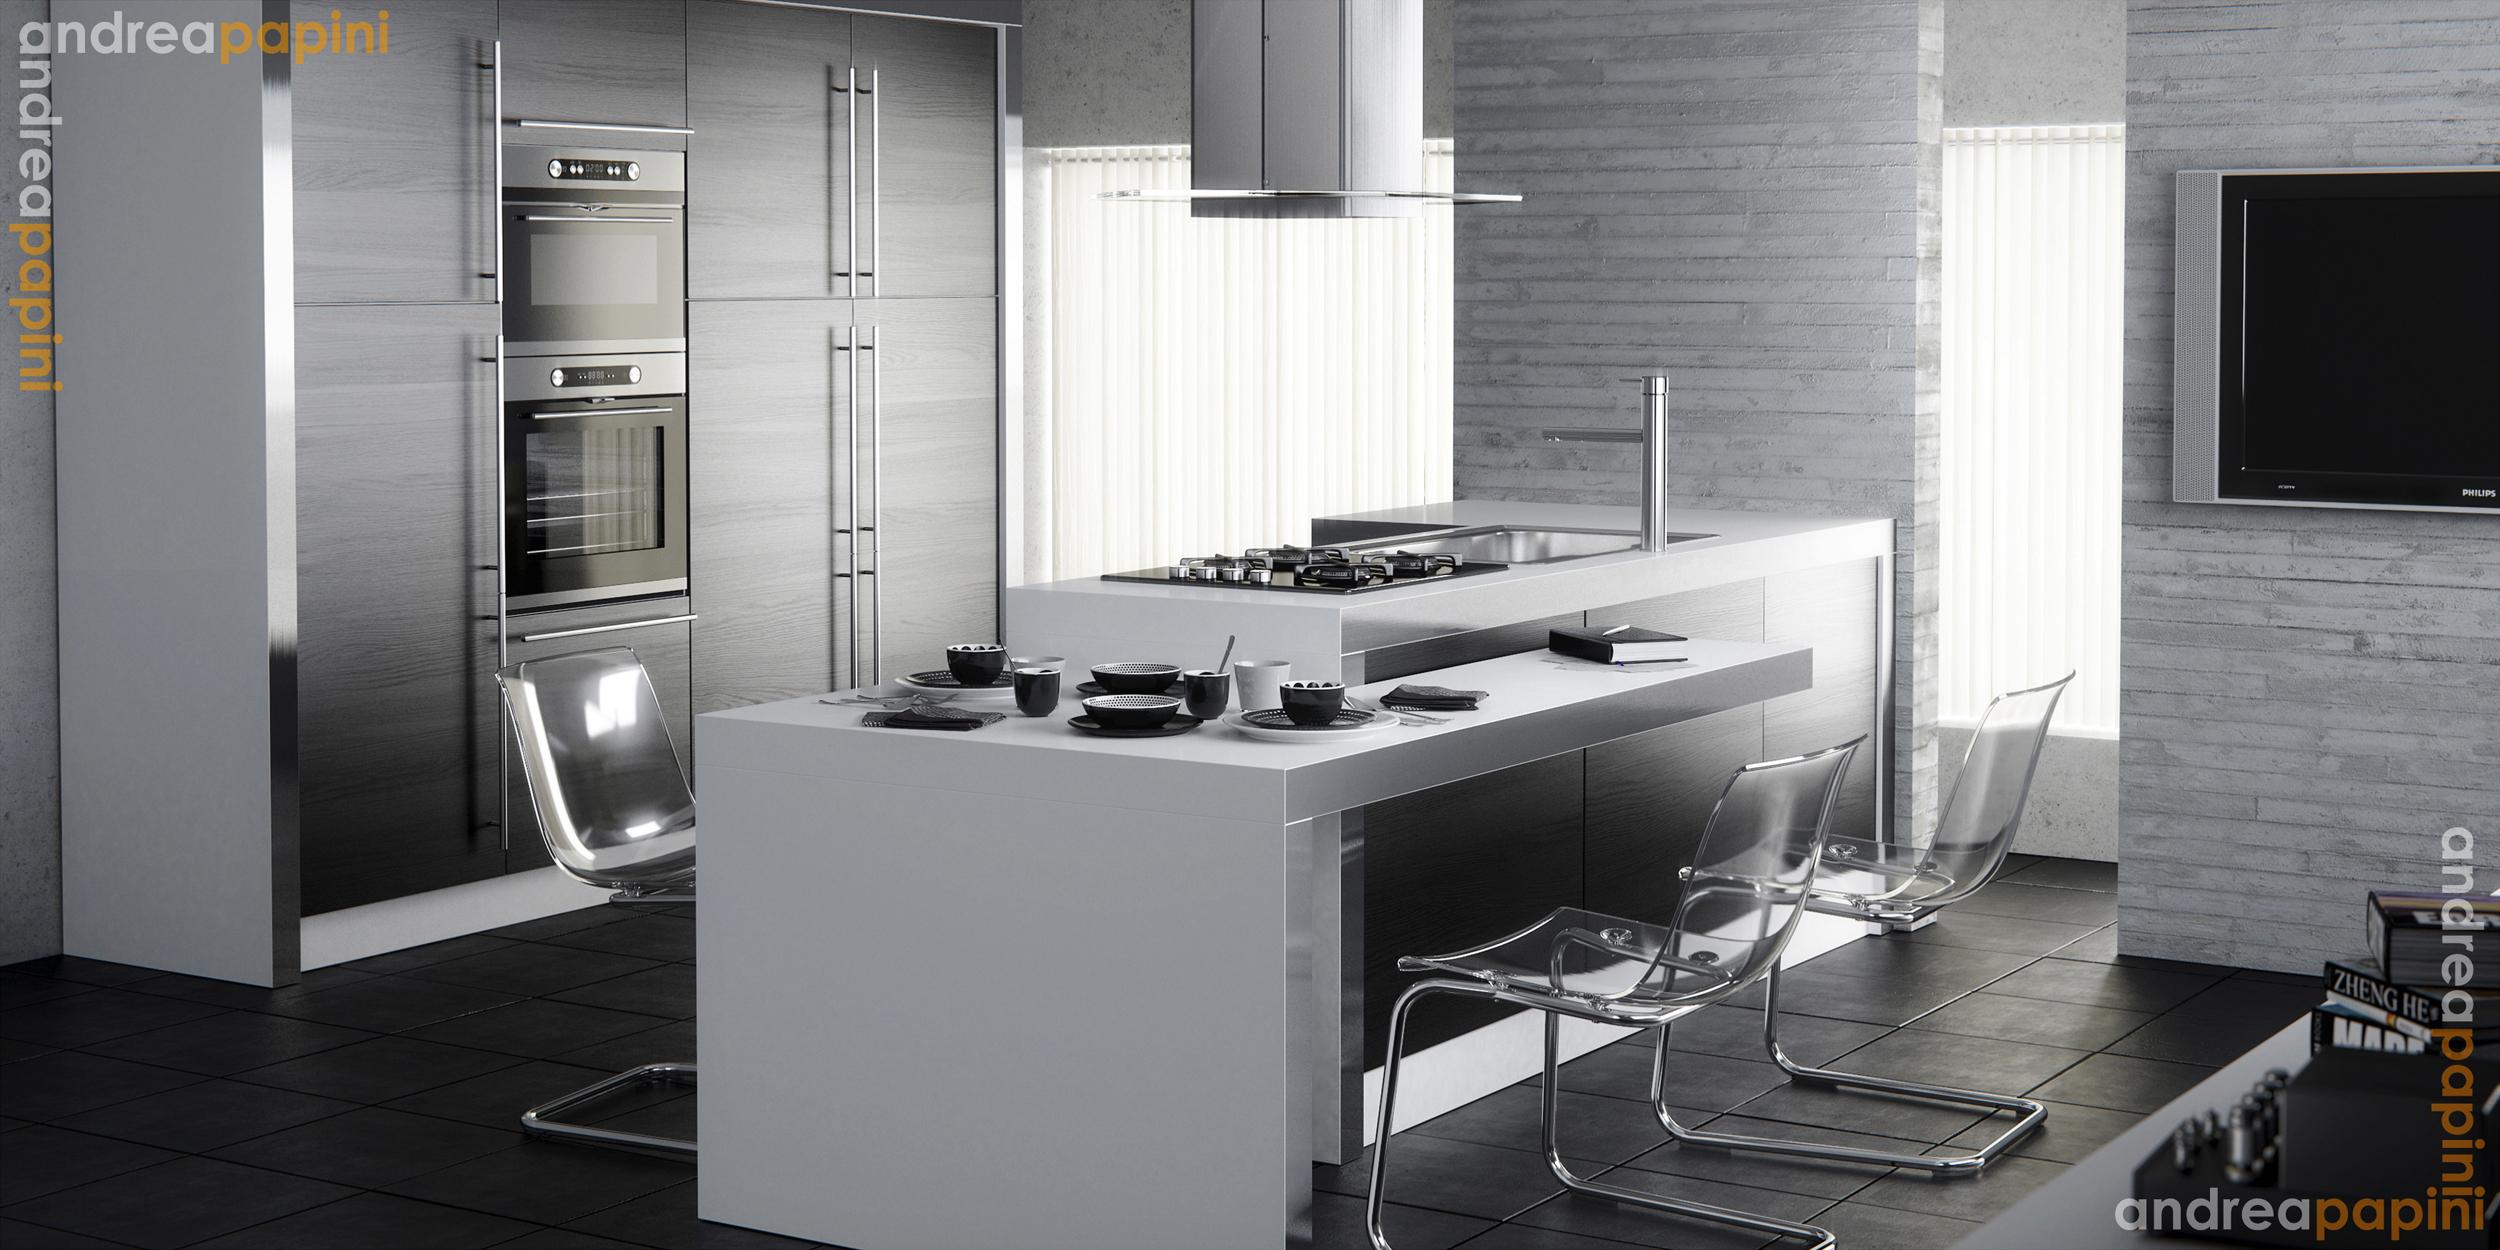 white kitchens white kitchen ideas Designed by Andrea Papini